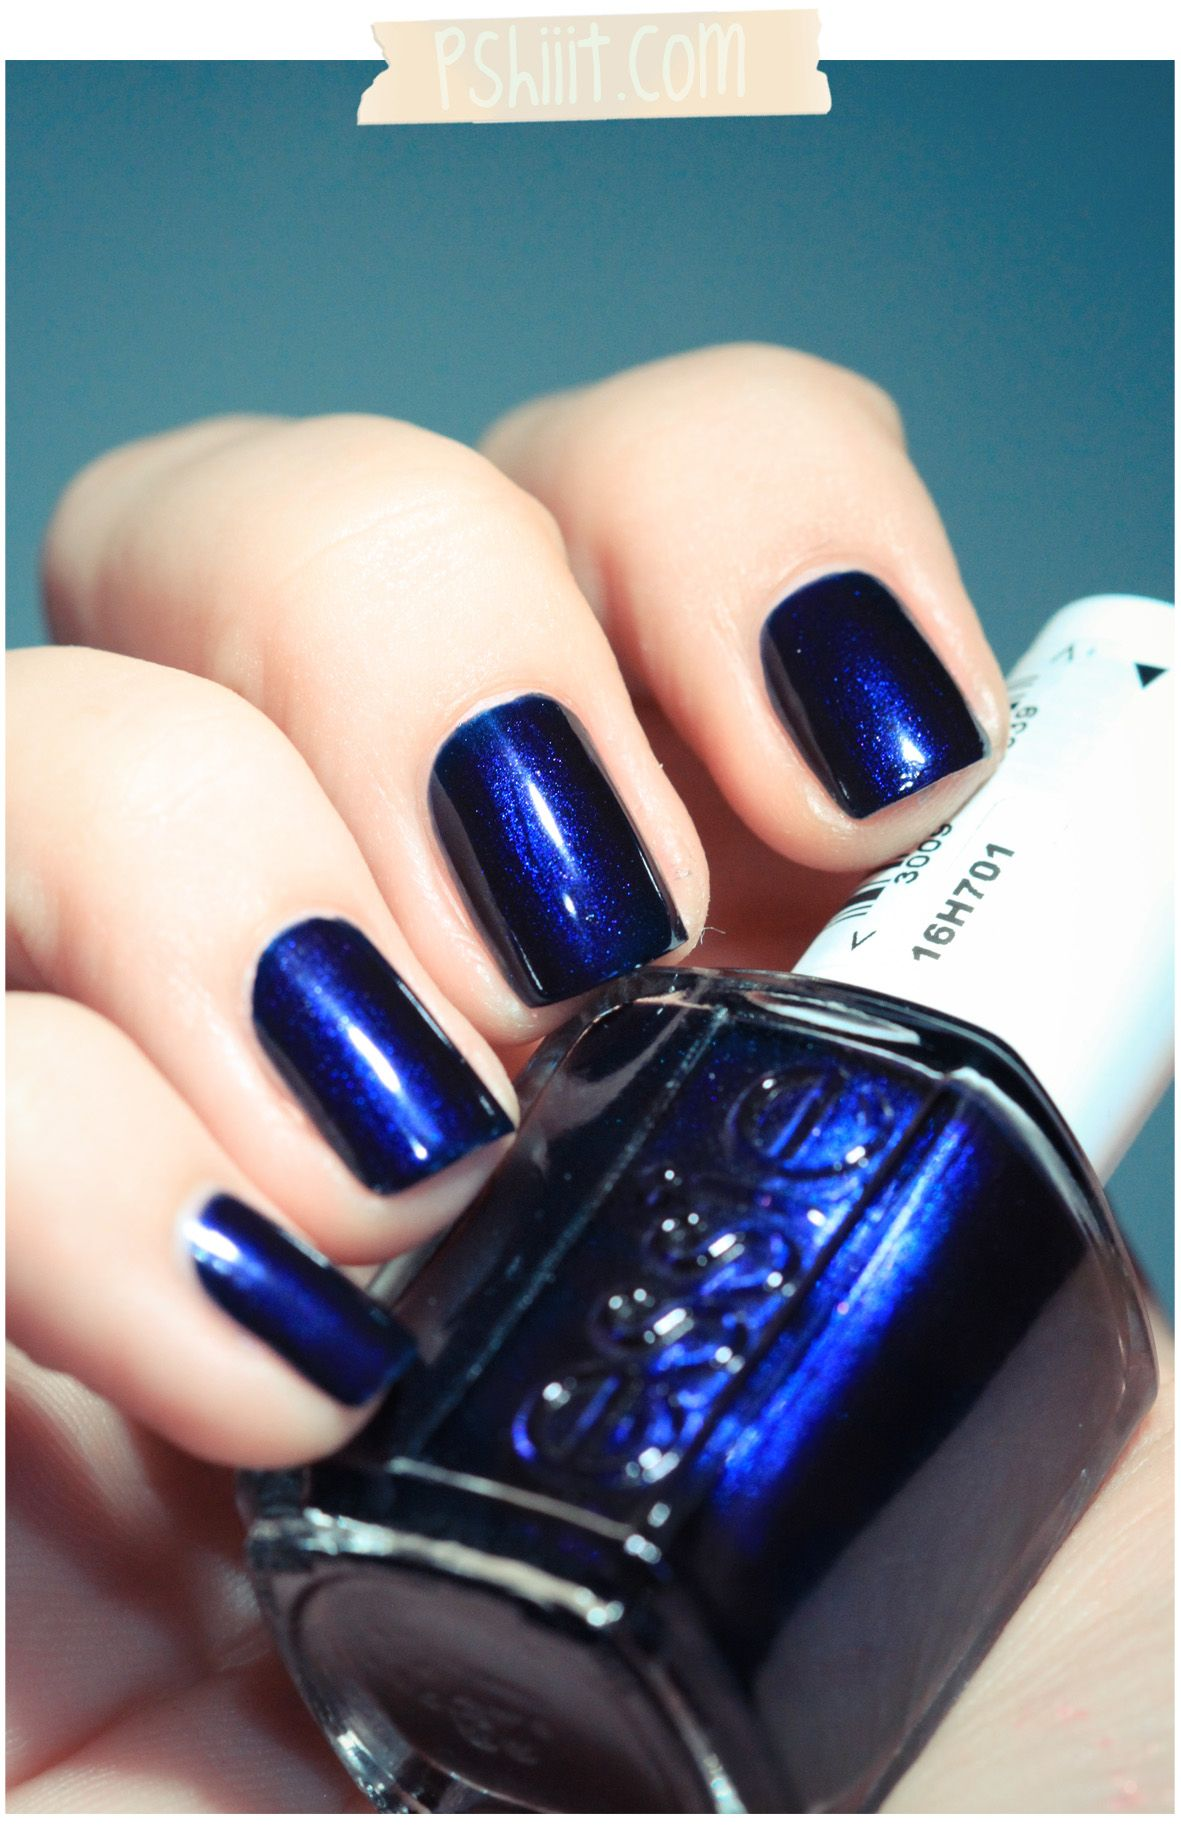 Essie – Midnight Cami & Kleancolor matifié | Beauty nails, Make up ...